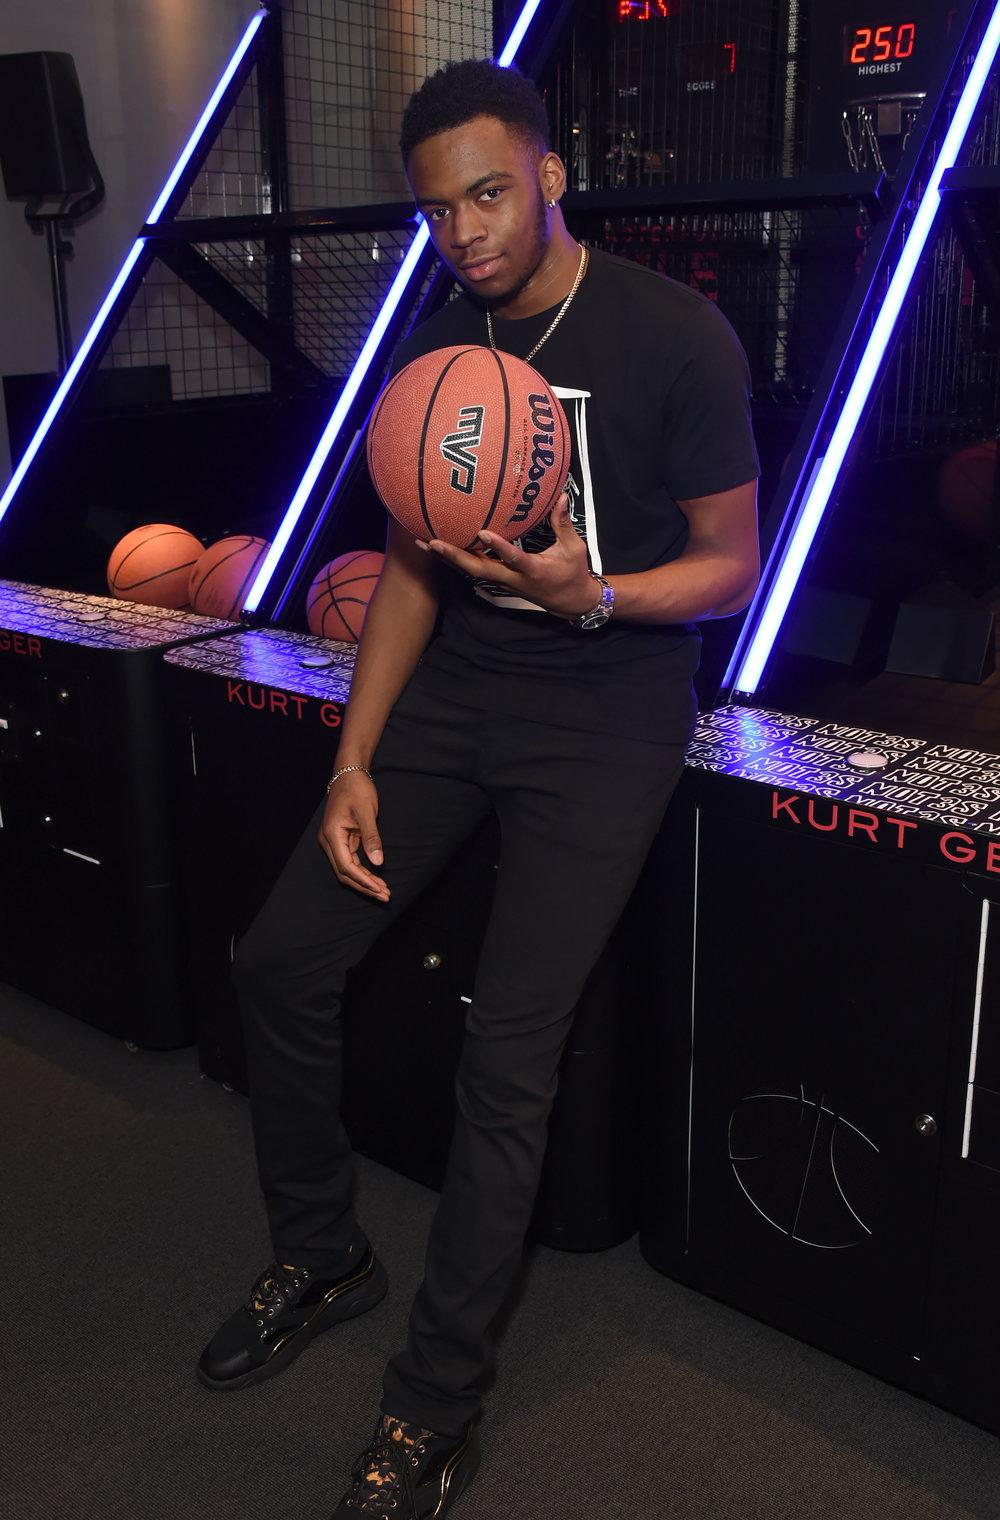 Not3s at the Kurt Geiger Event holding a basketball